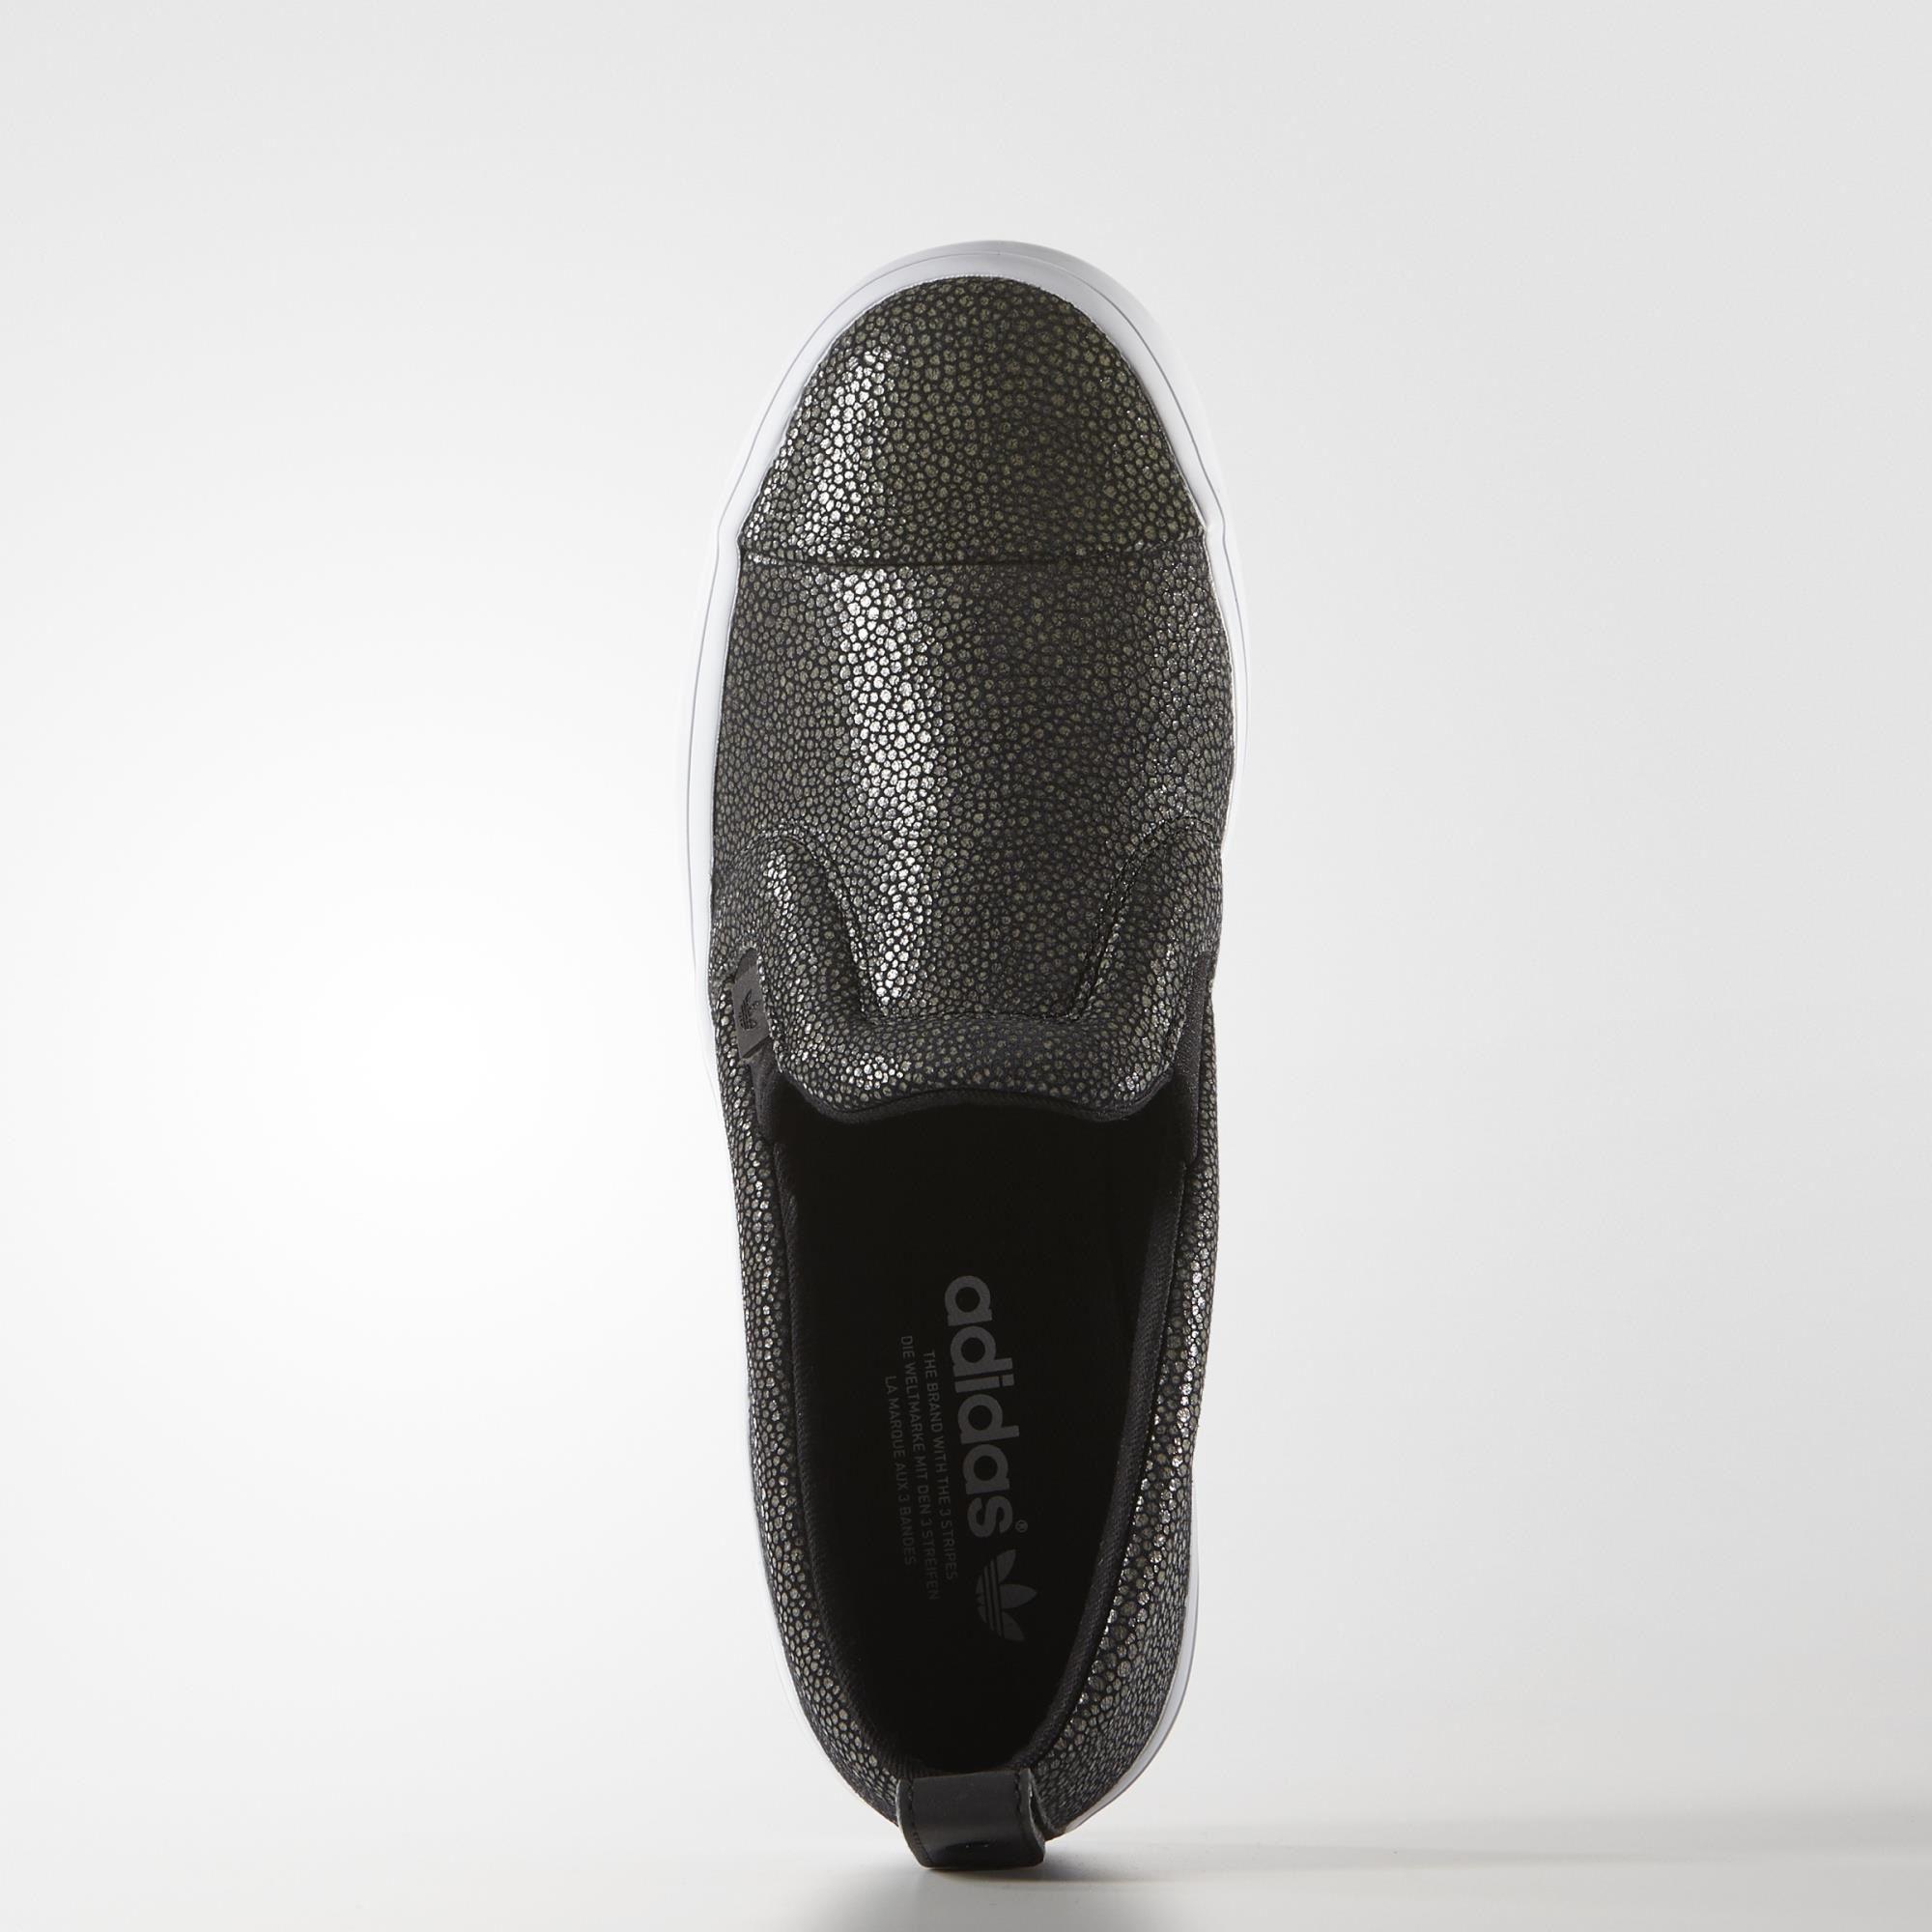 91d172f93fcb Honey 2.0 Slip-On Shoes - noir adidas